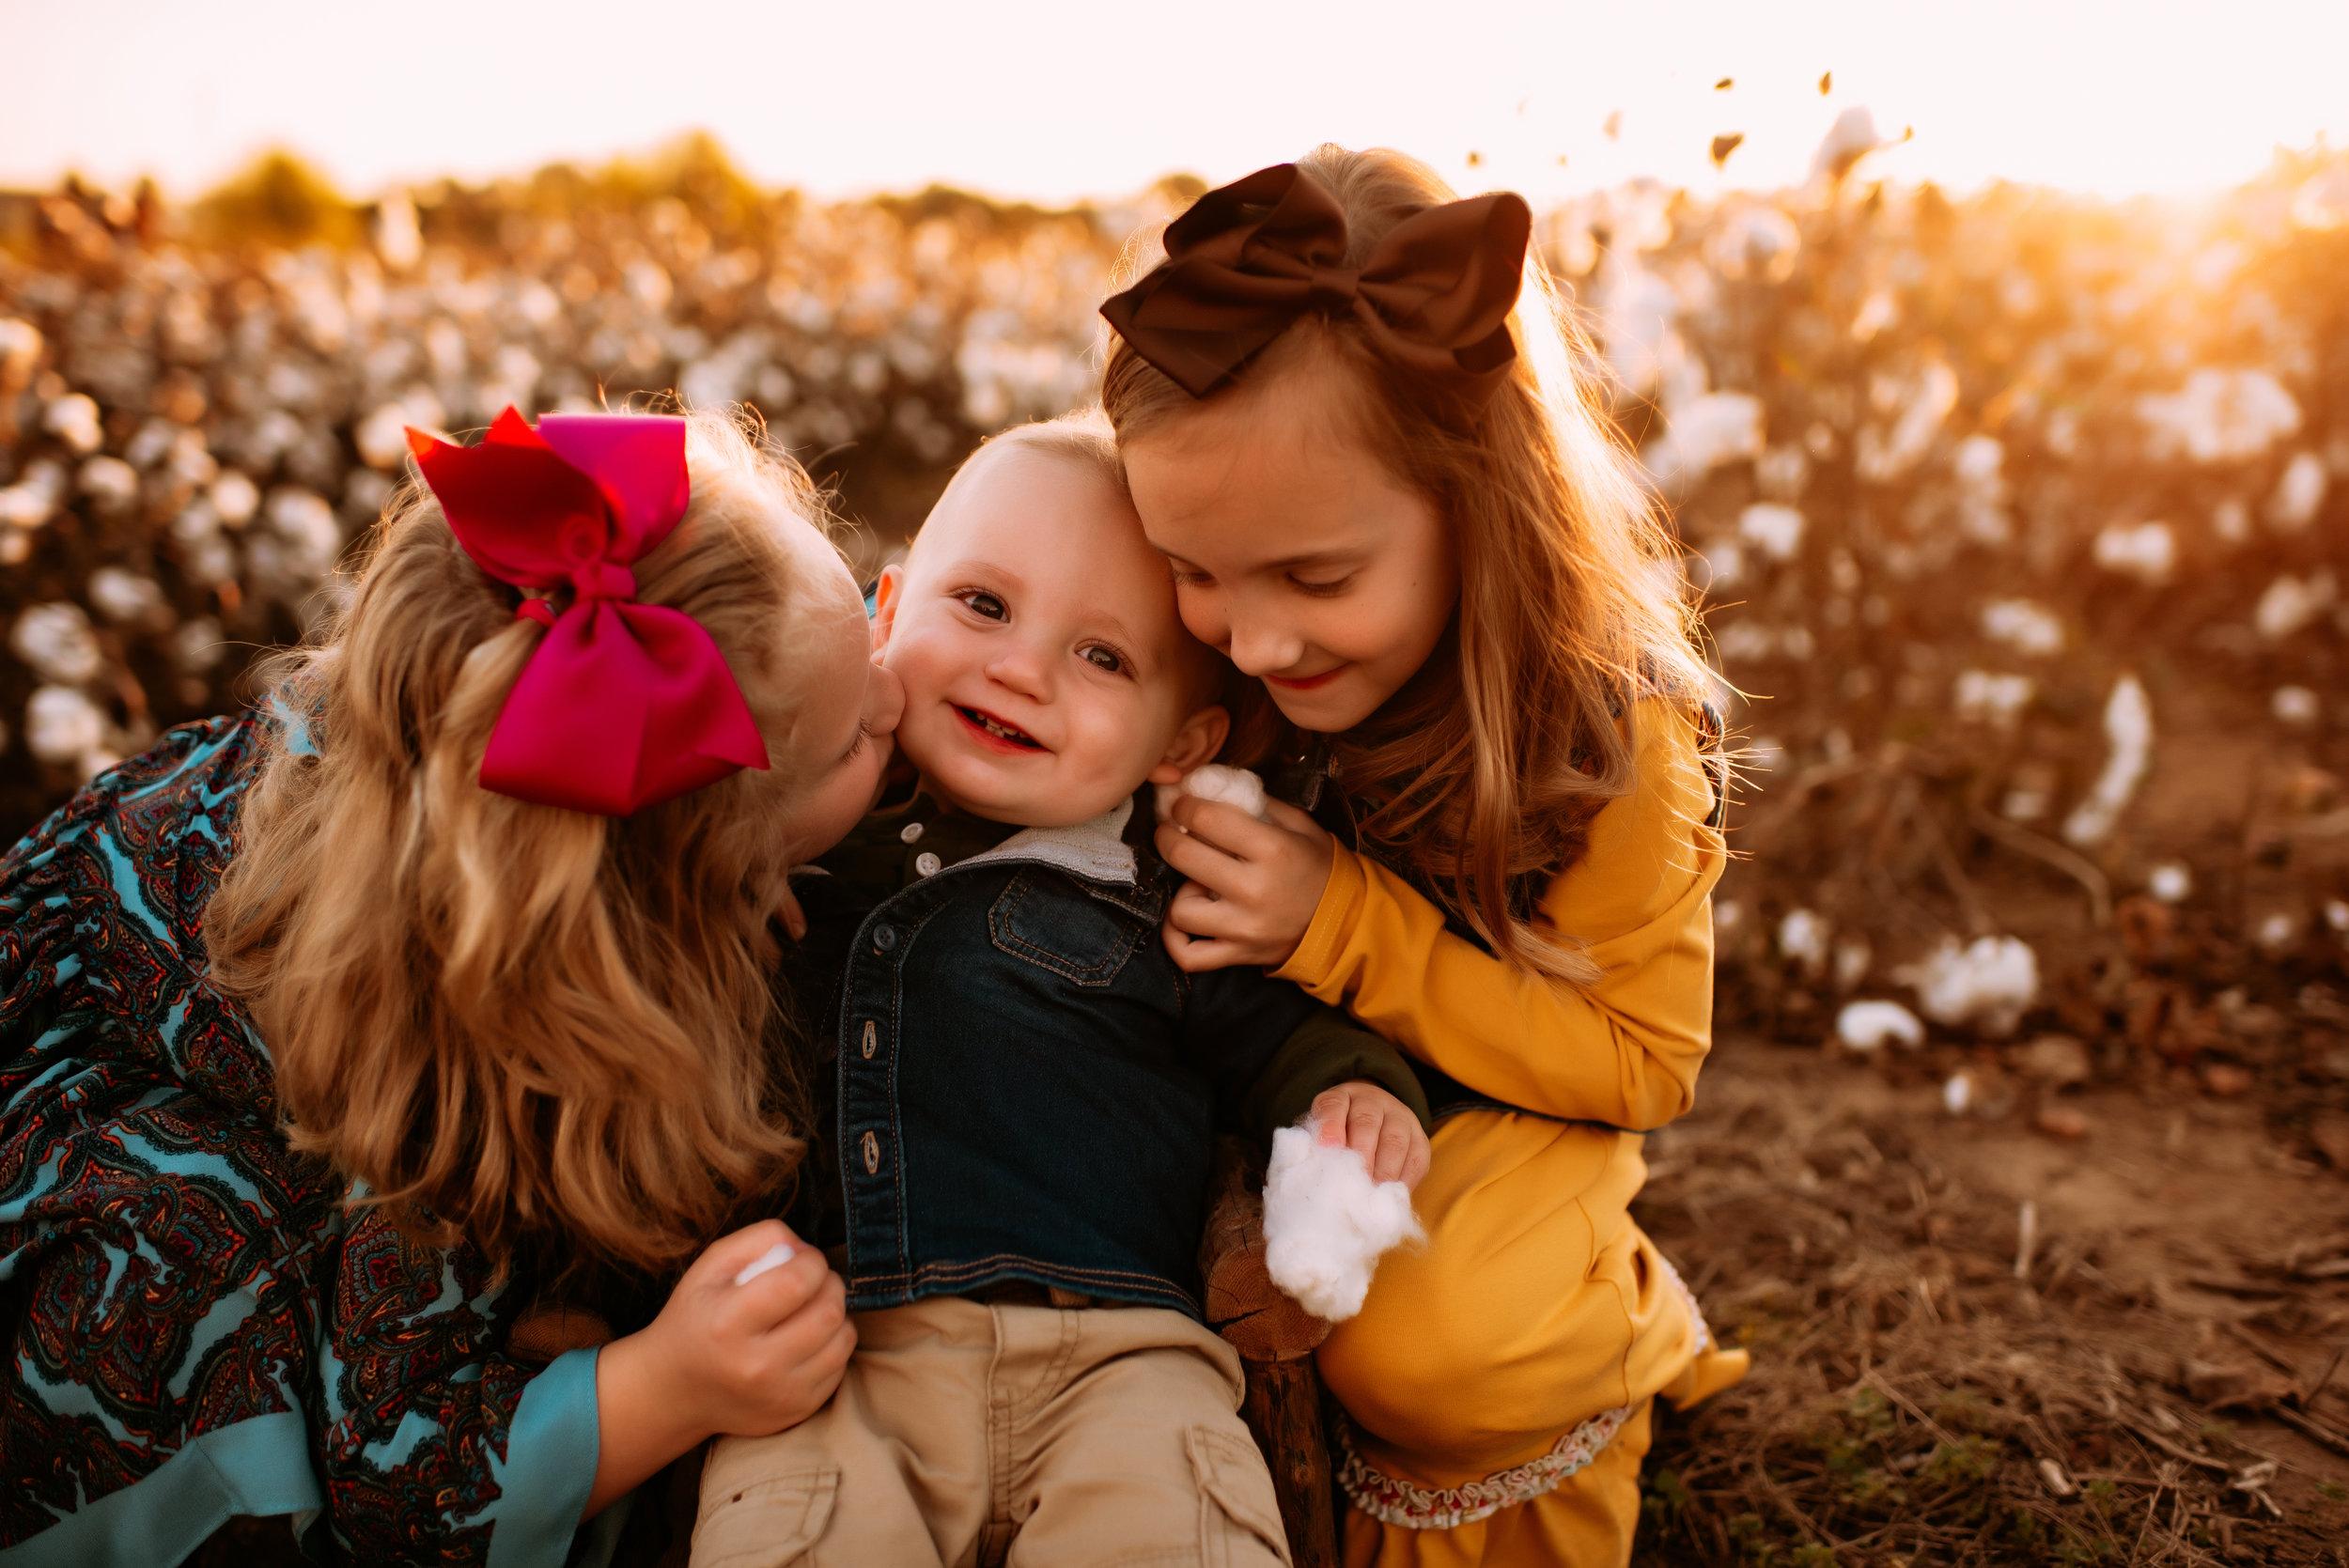 whitehead-family-madison-alabama-cotton-field-family-photo-session-20.jpg